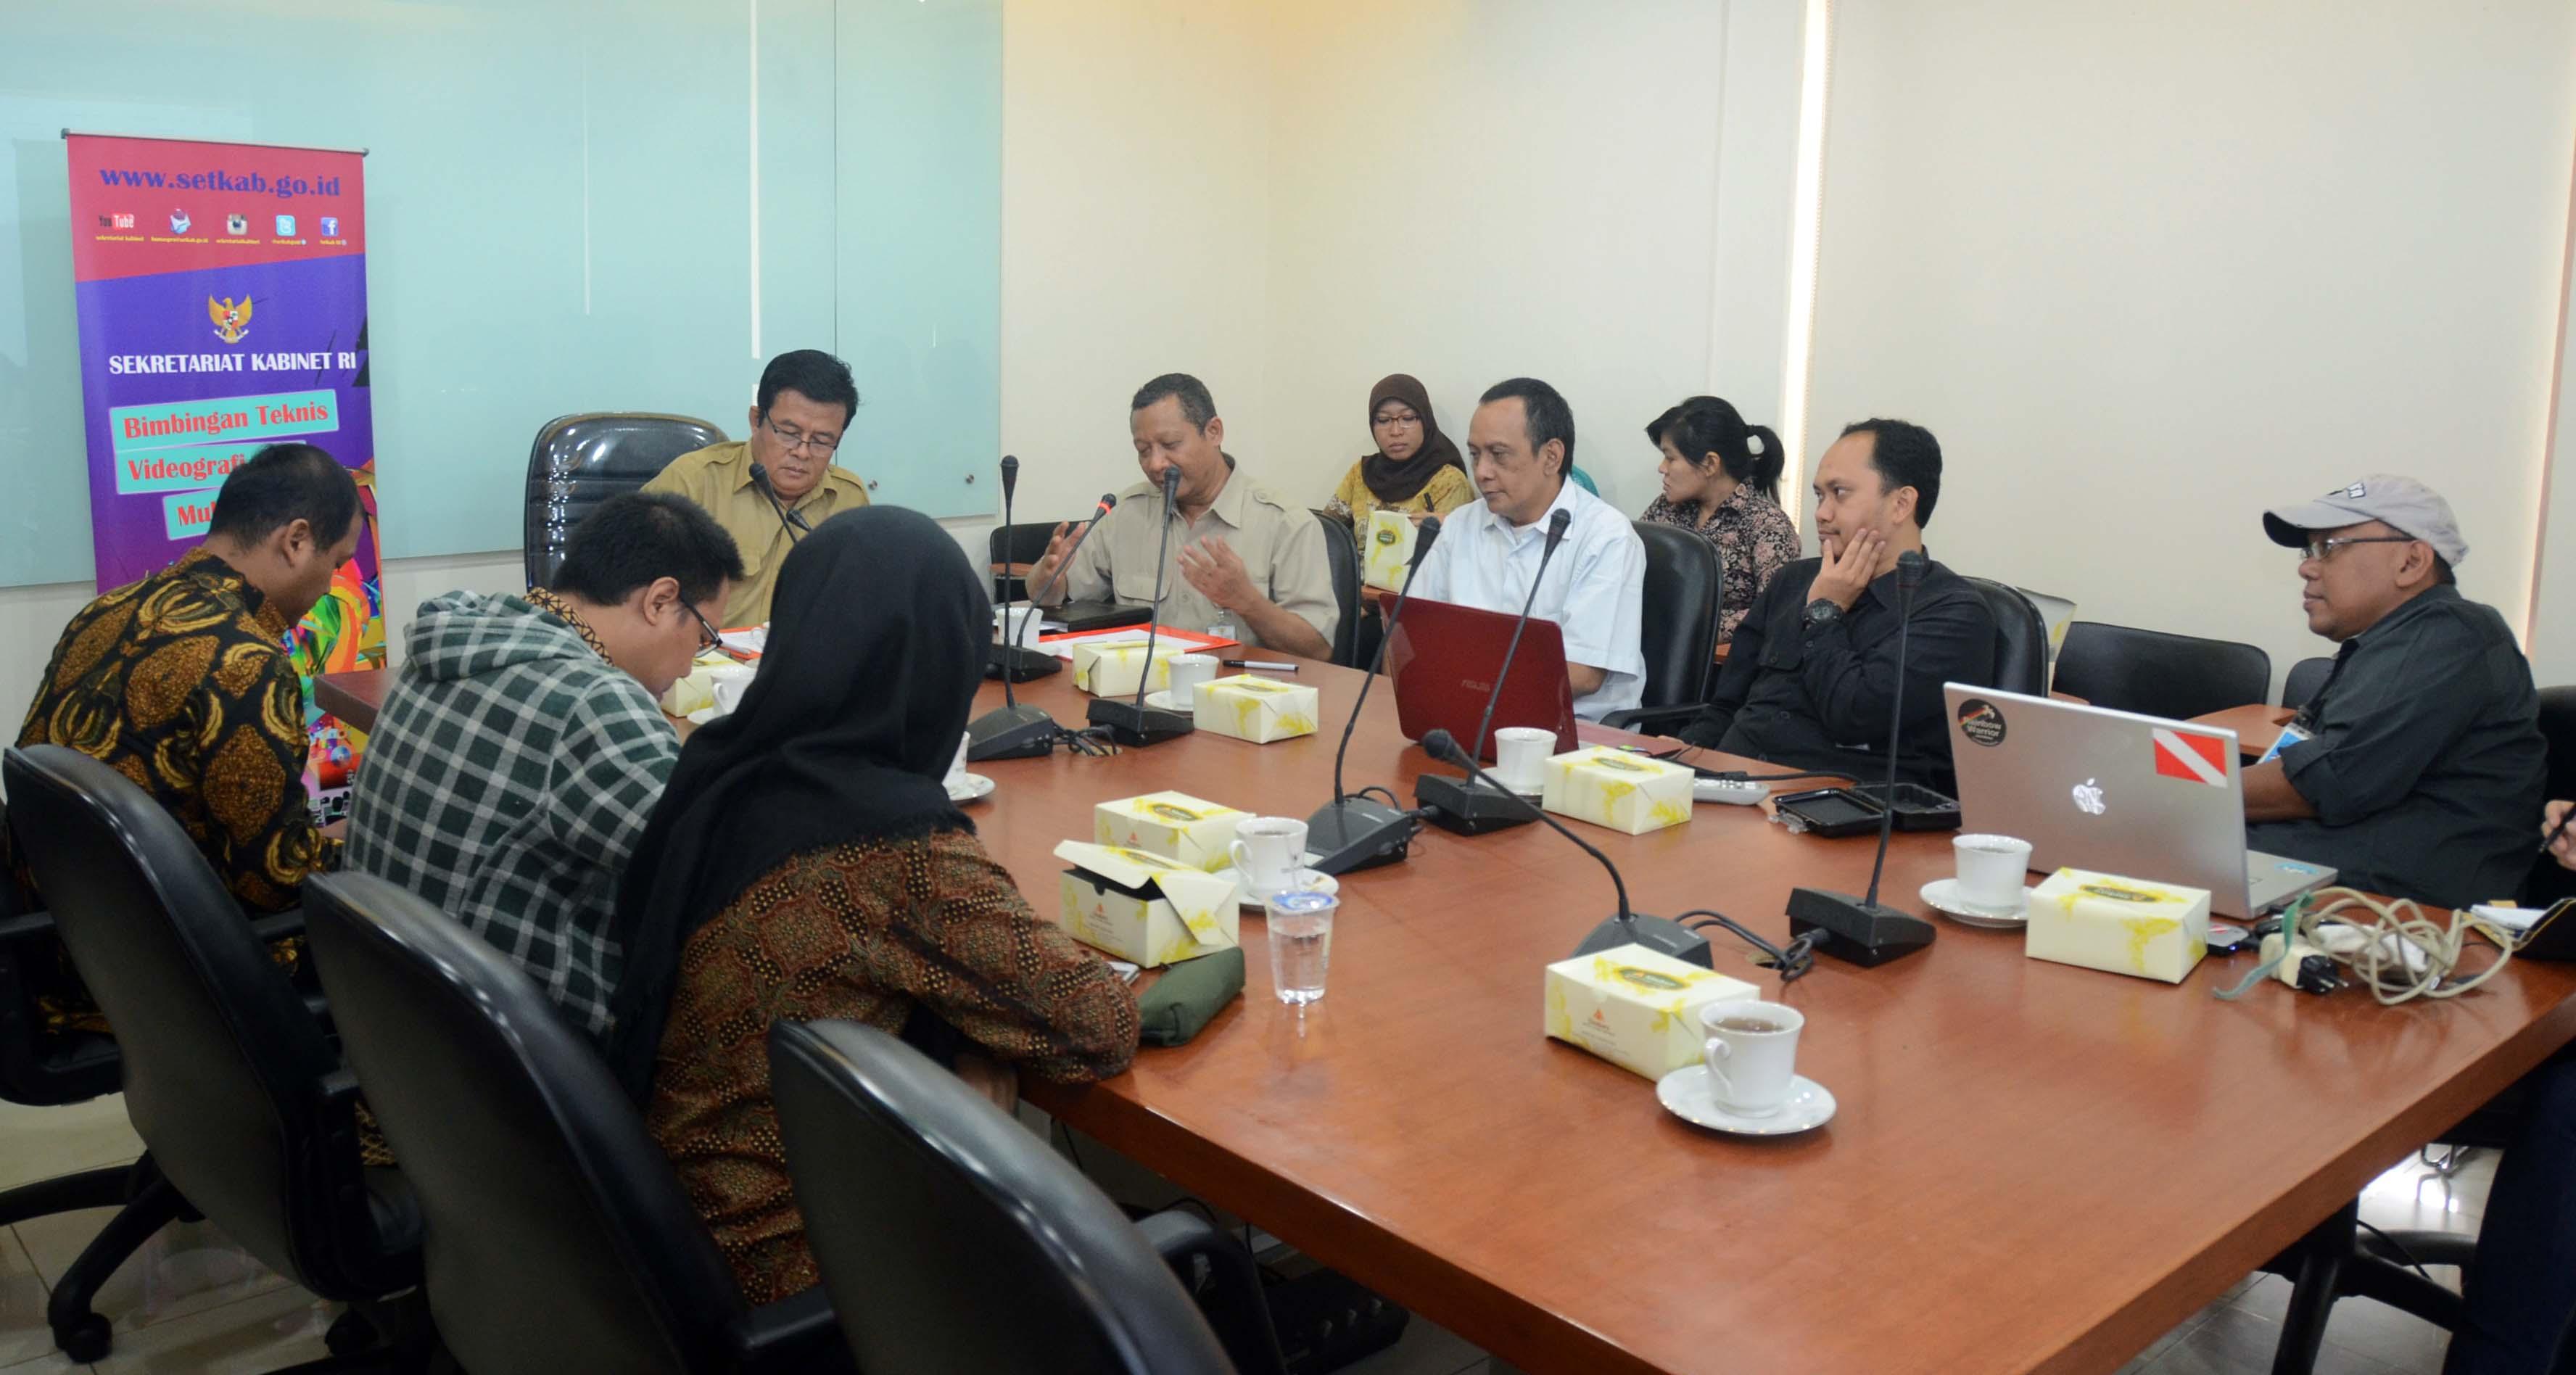 Asdep humas dan protokol setkab gelar bimtek videografi dan multimedia sekretariat kabinet - Kabinet multimedia ...